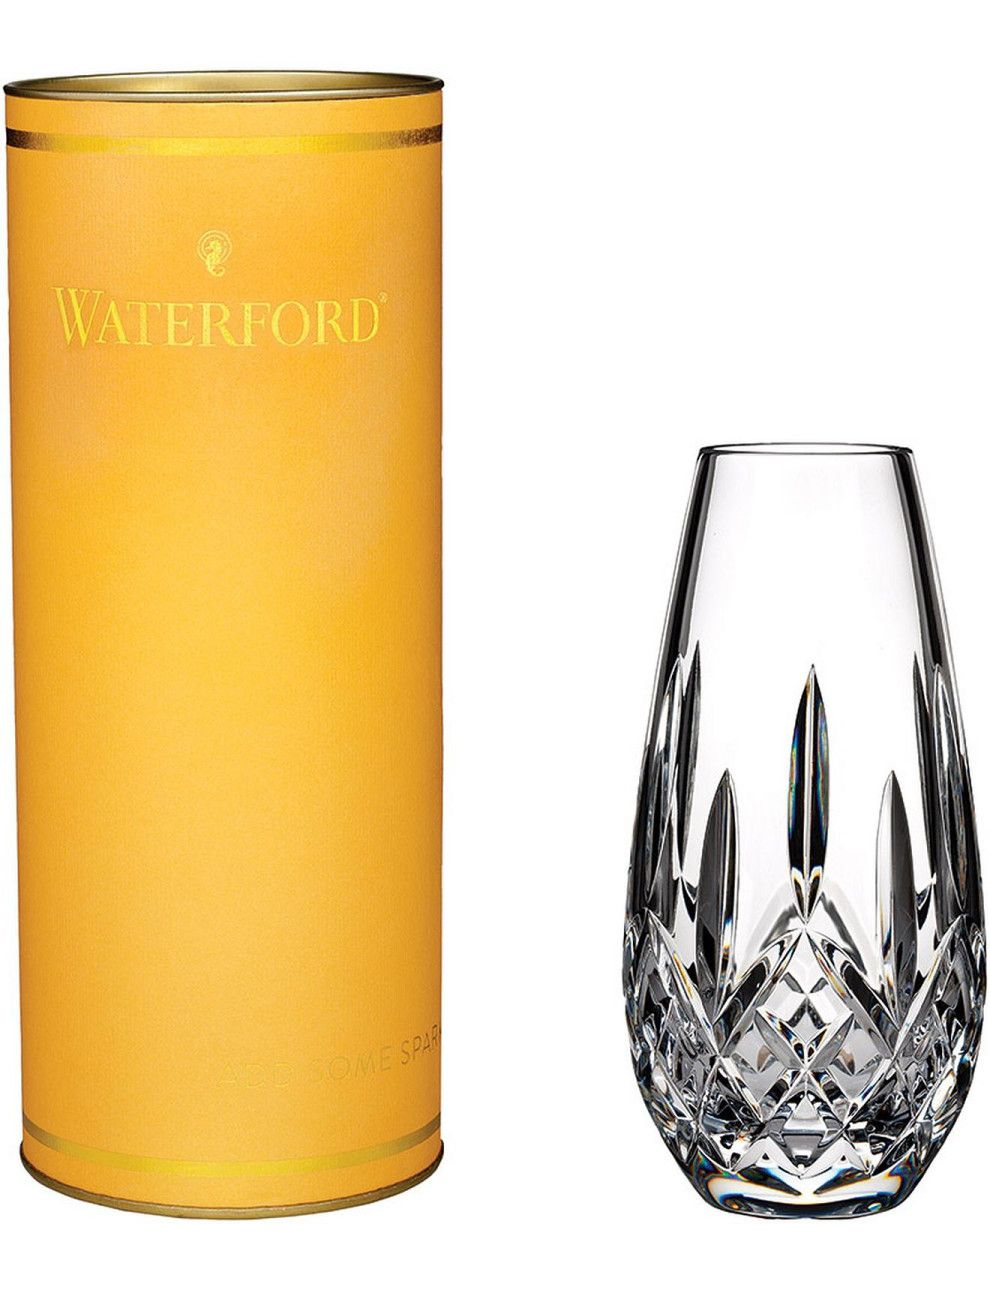 Waterford Giftology Lismore Honey Bud Vase David Jones Wedding